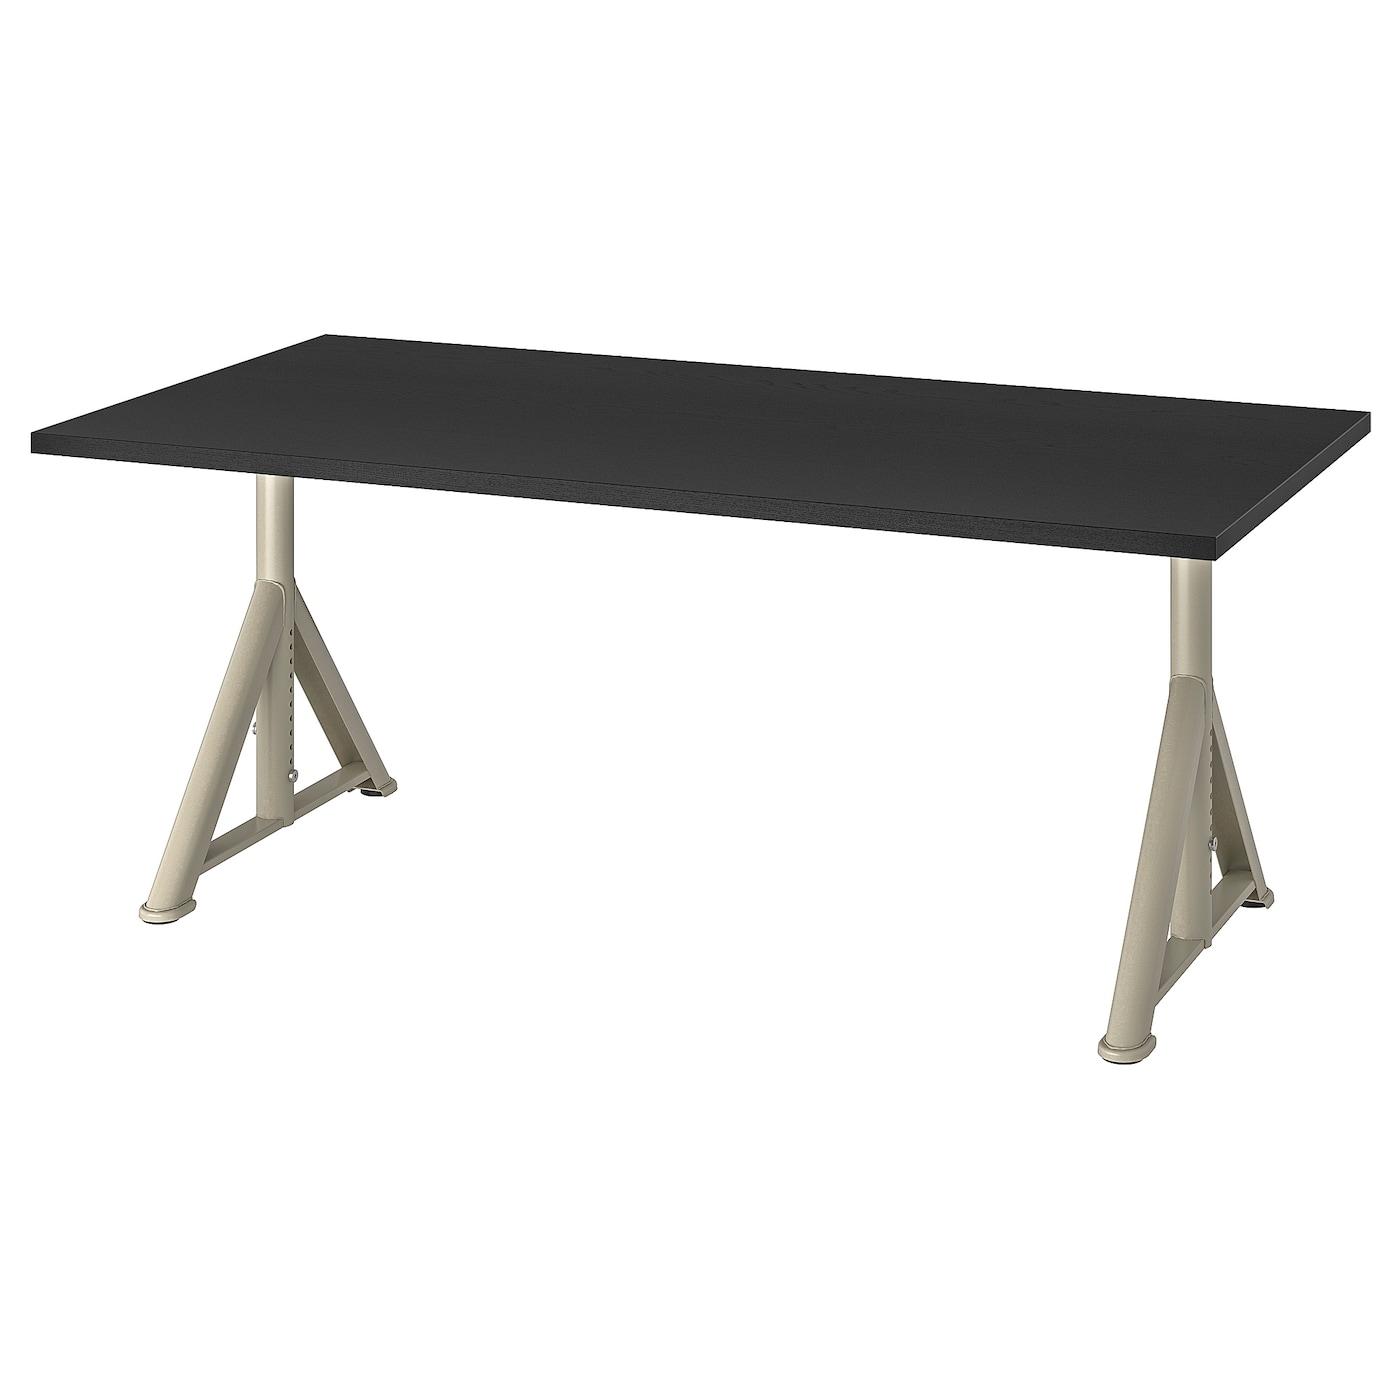 IKEA IDÅSEN Biurko, czarny, beżowy, 160x80 cm